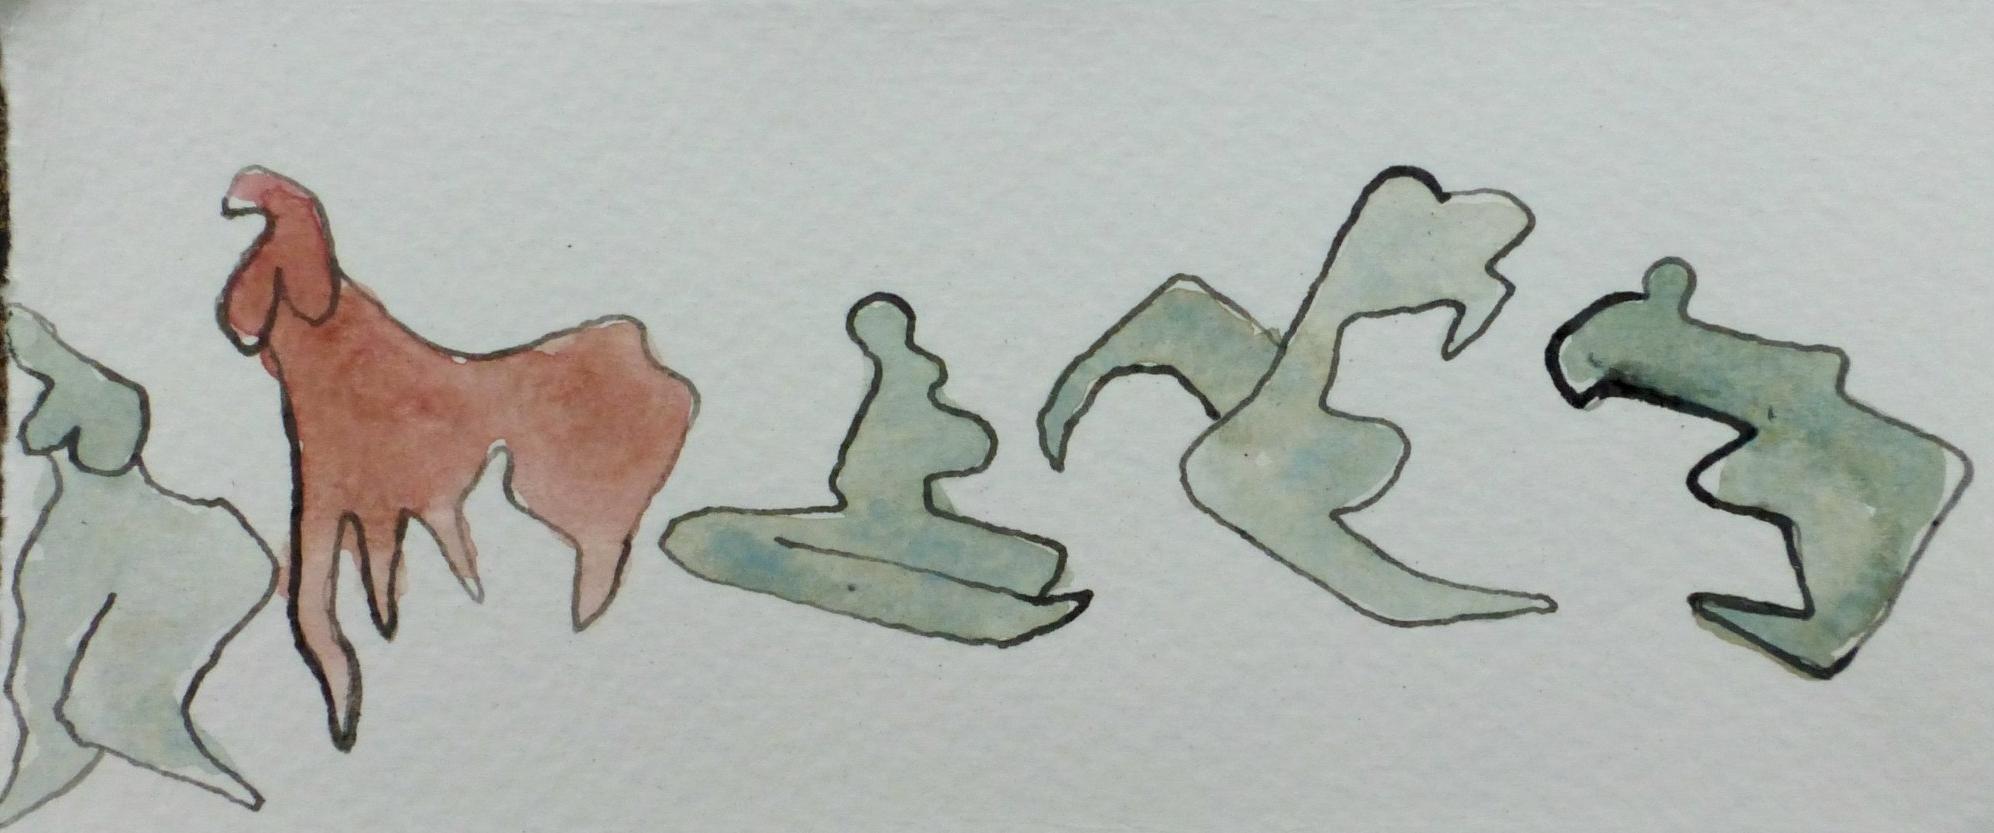 Frieze Sketch.jpg